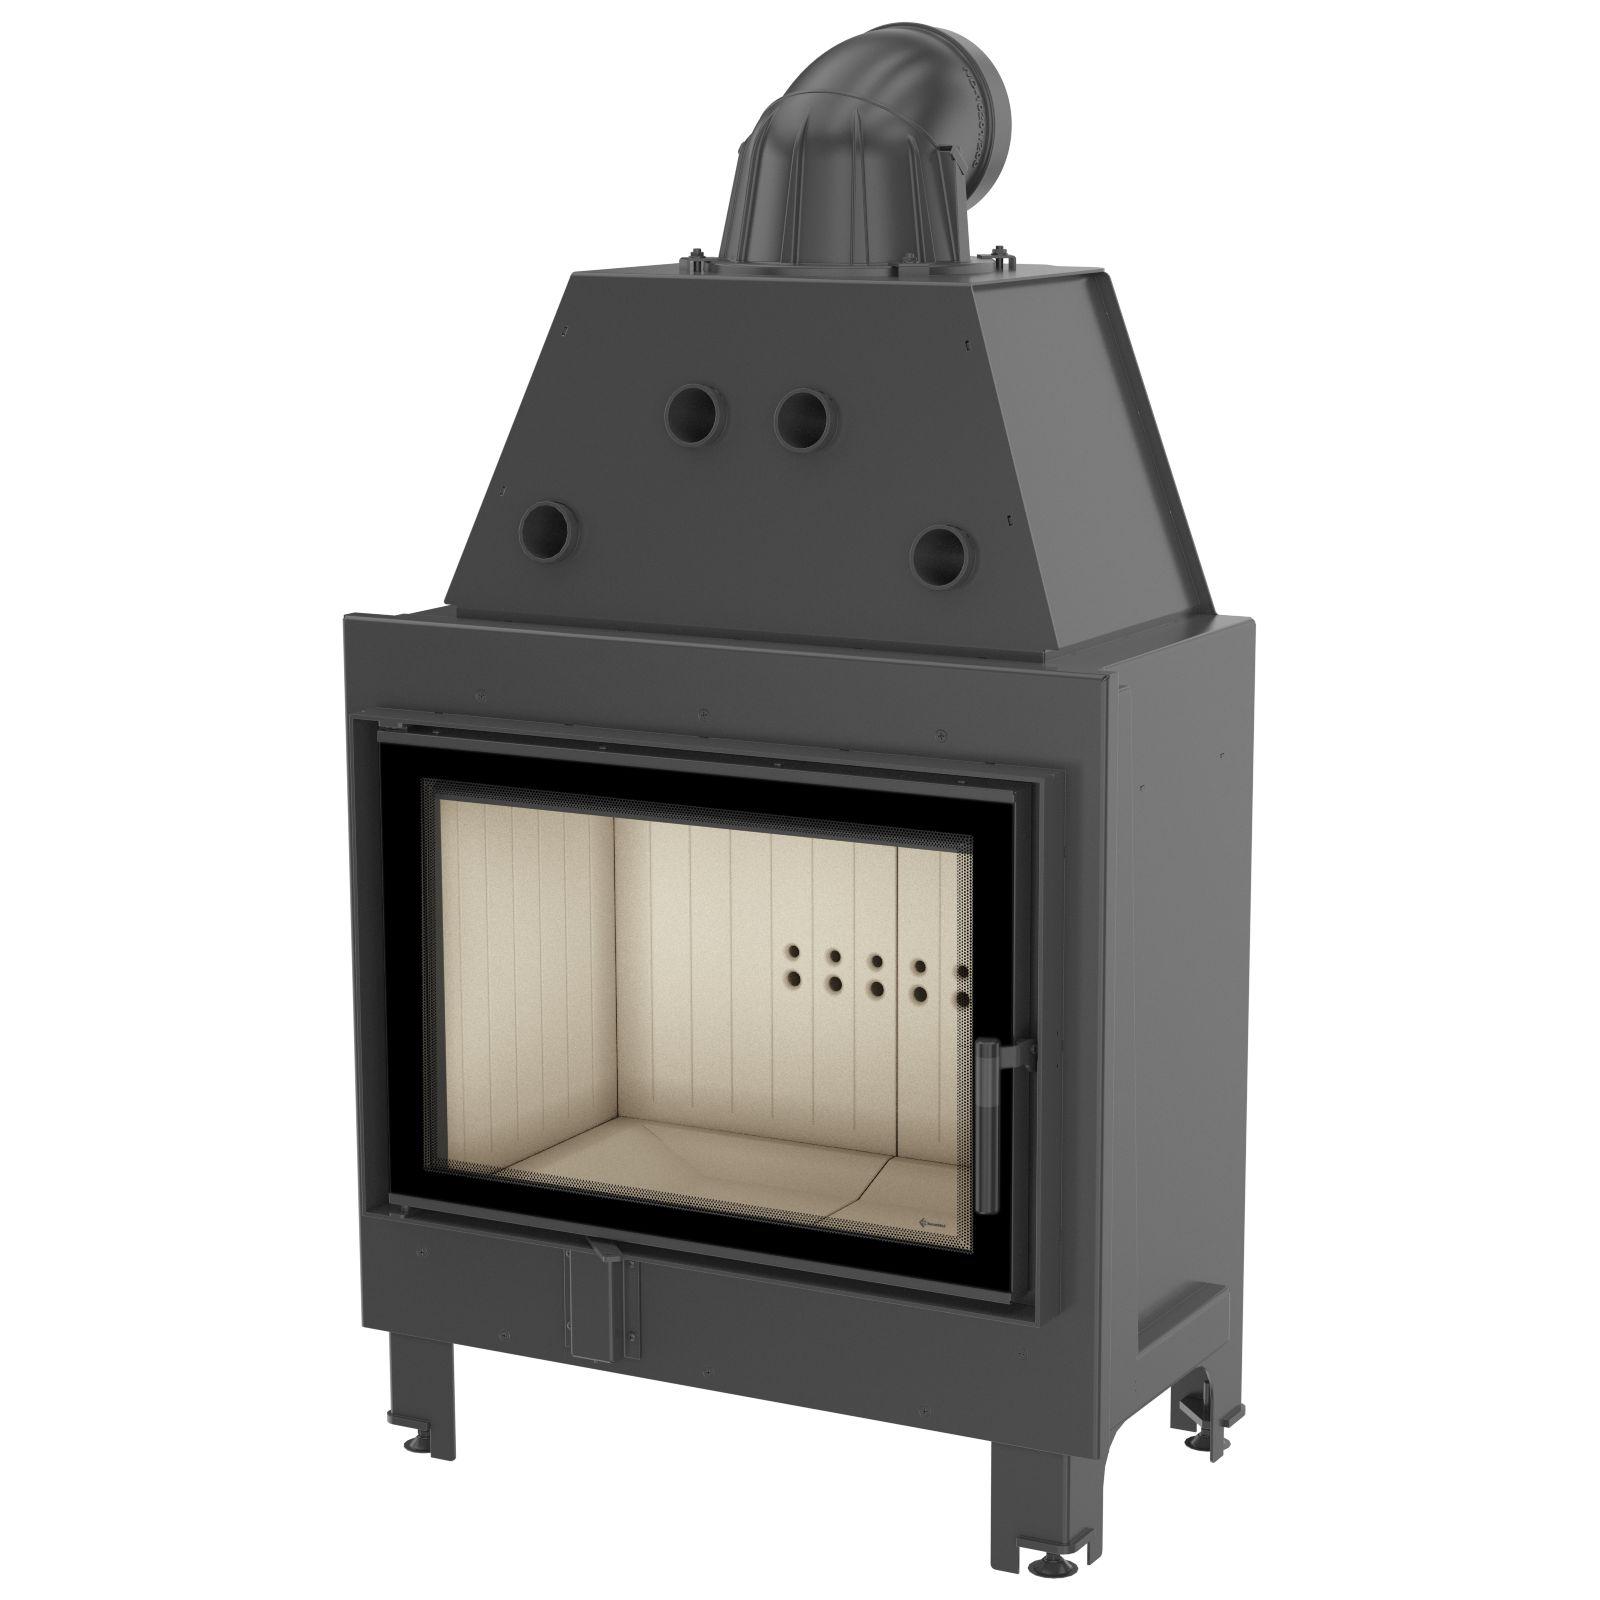 kamineinsatz kratki mbo 15 kw. Black Bedroom Furniture Sets. Home Design Ideas